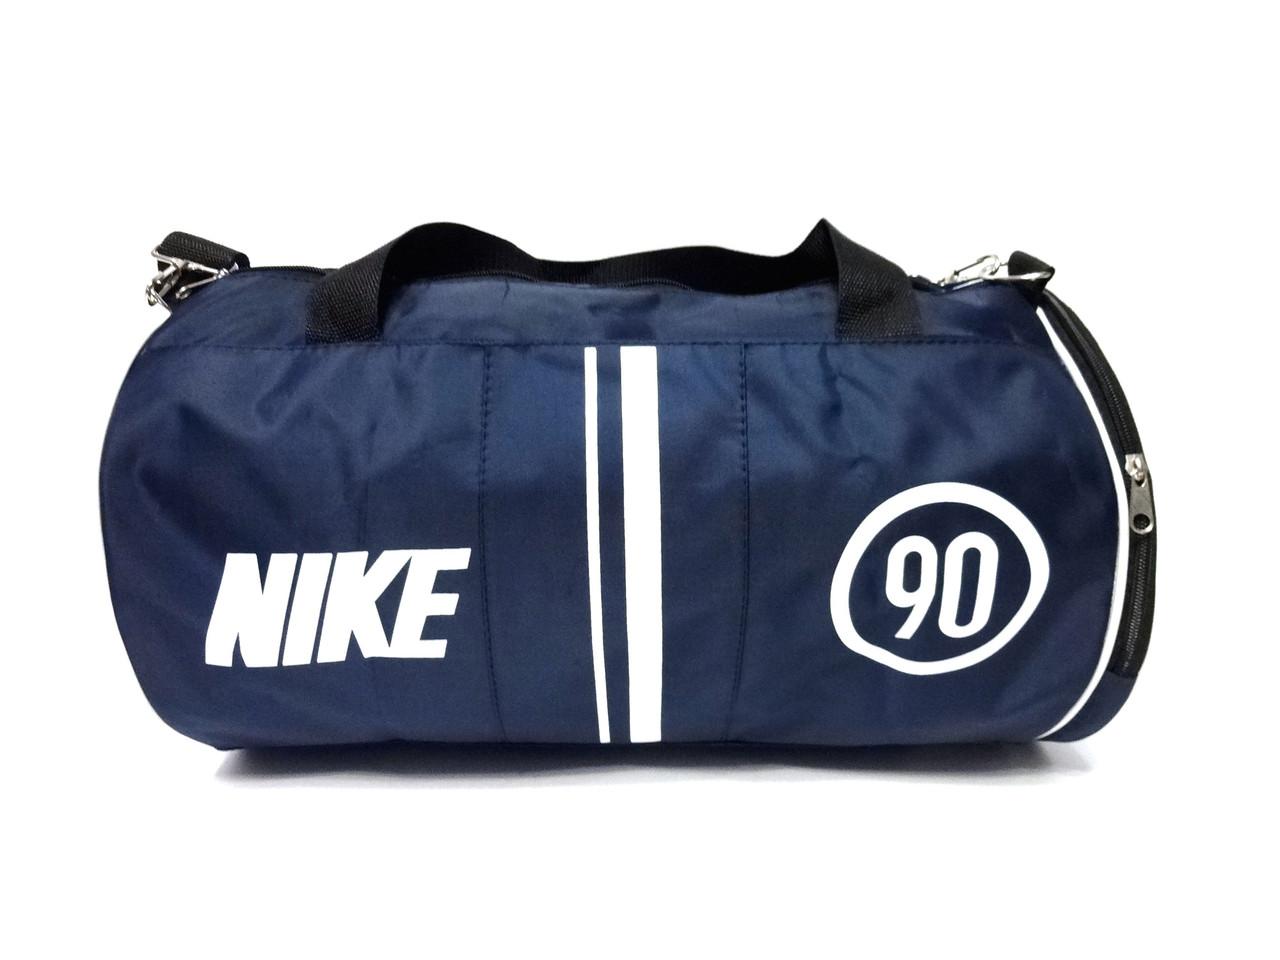 Темно синяя спортивная сумка Nike 90, цилиндр туба реплика